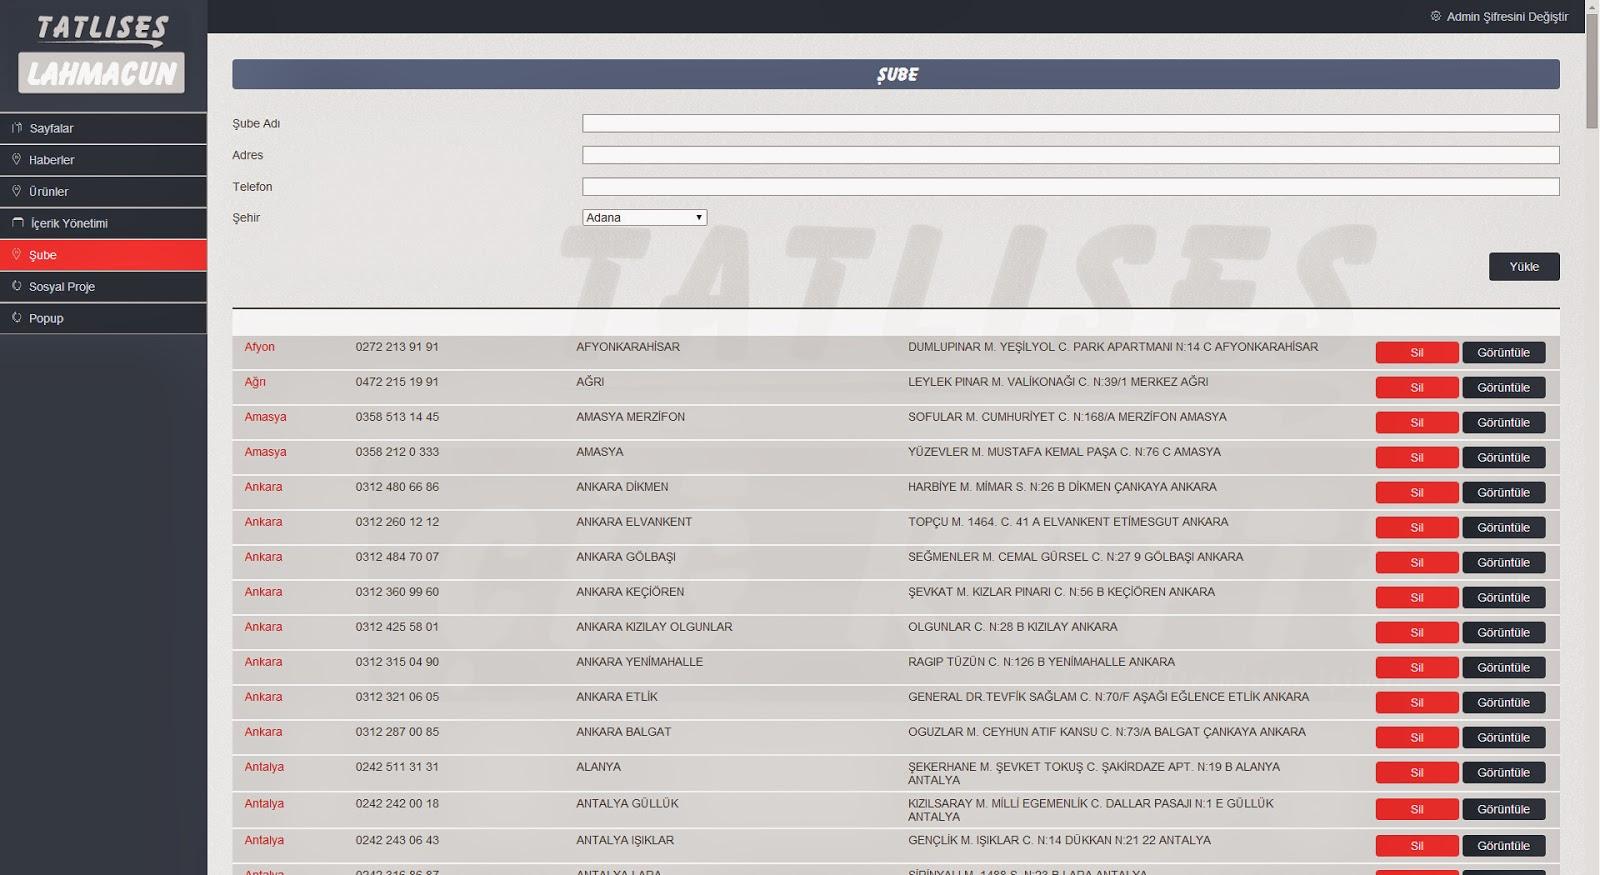 Tatlıses Lahmacun Web Tasarım - Responsive Admin Paneli